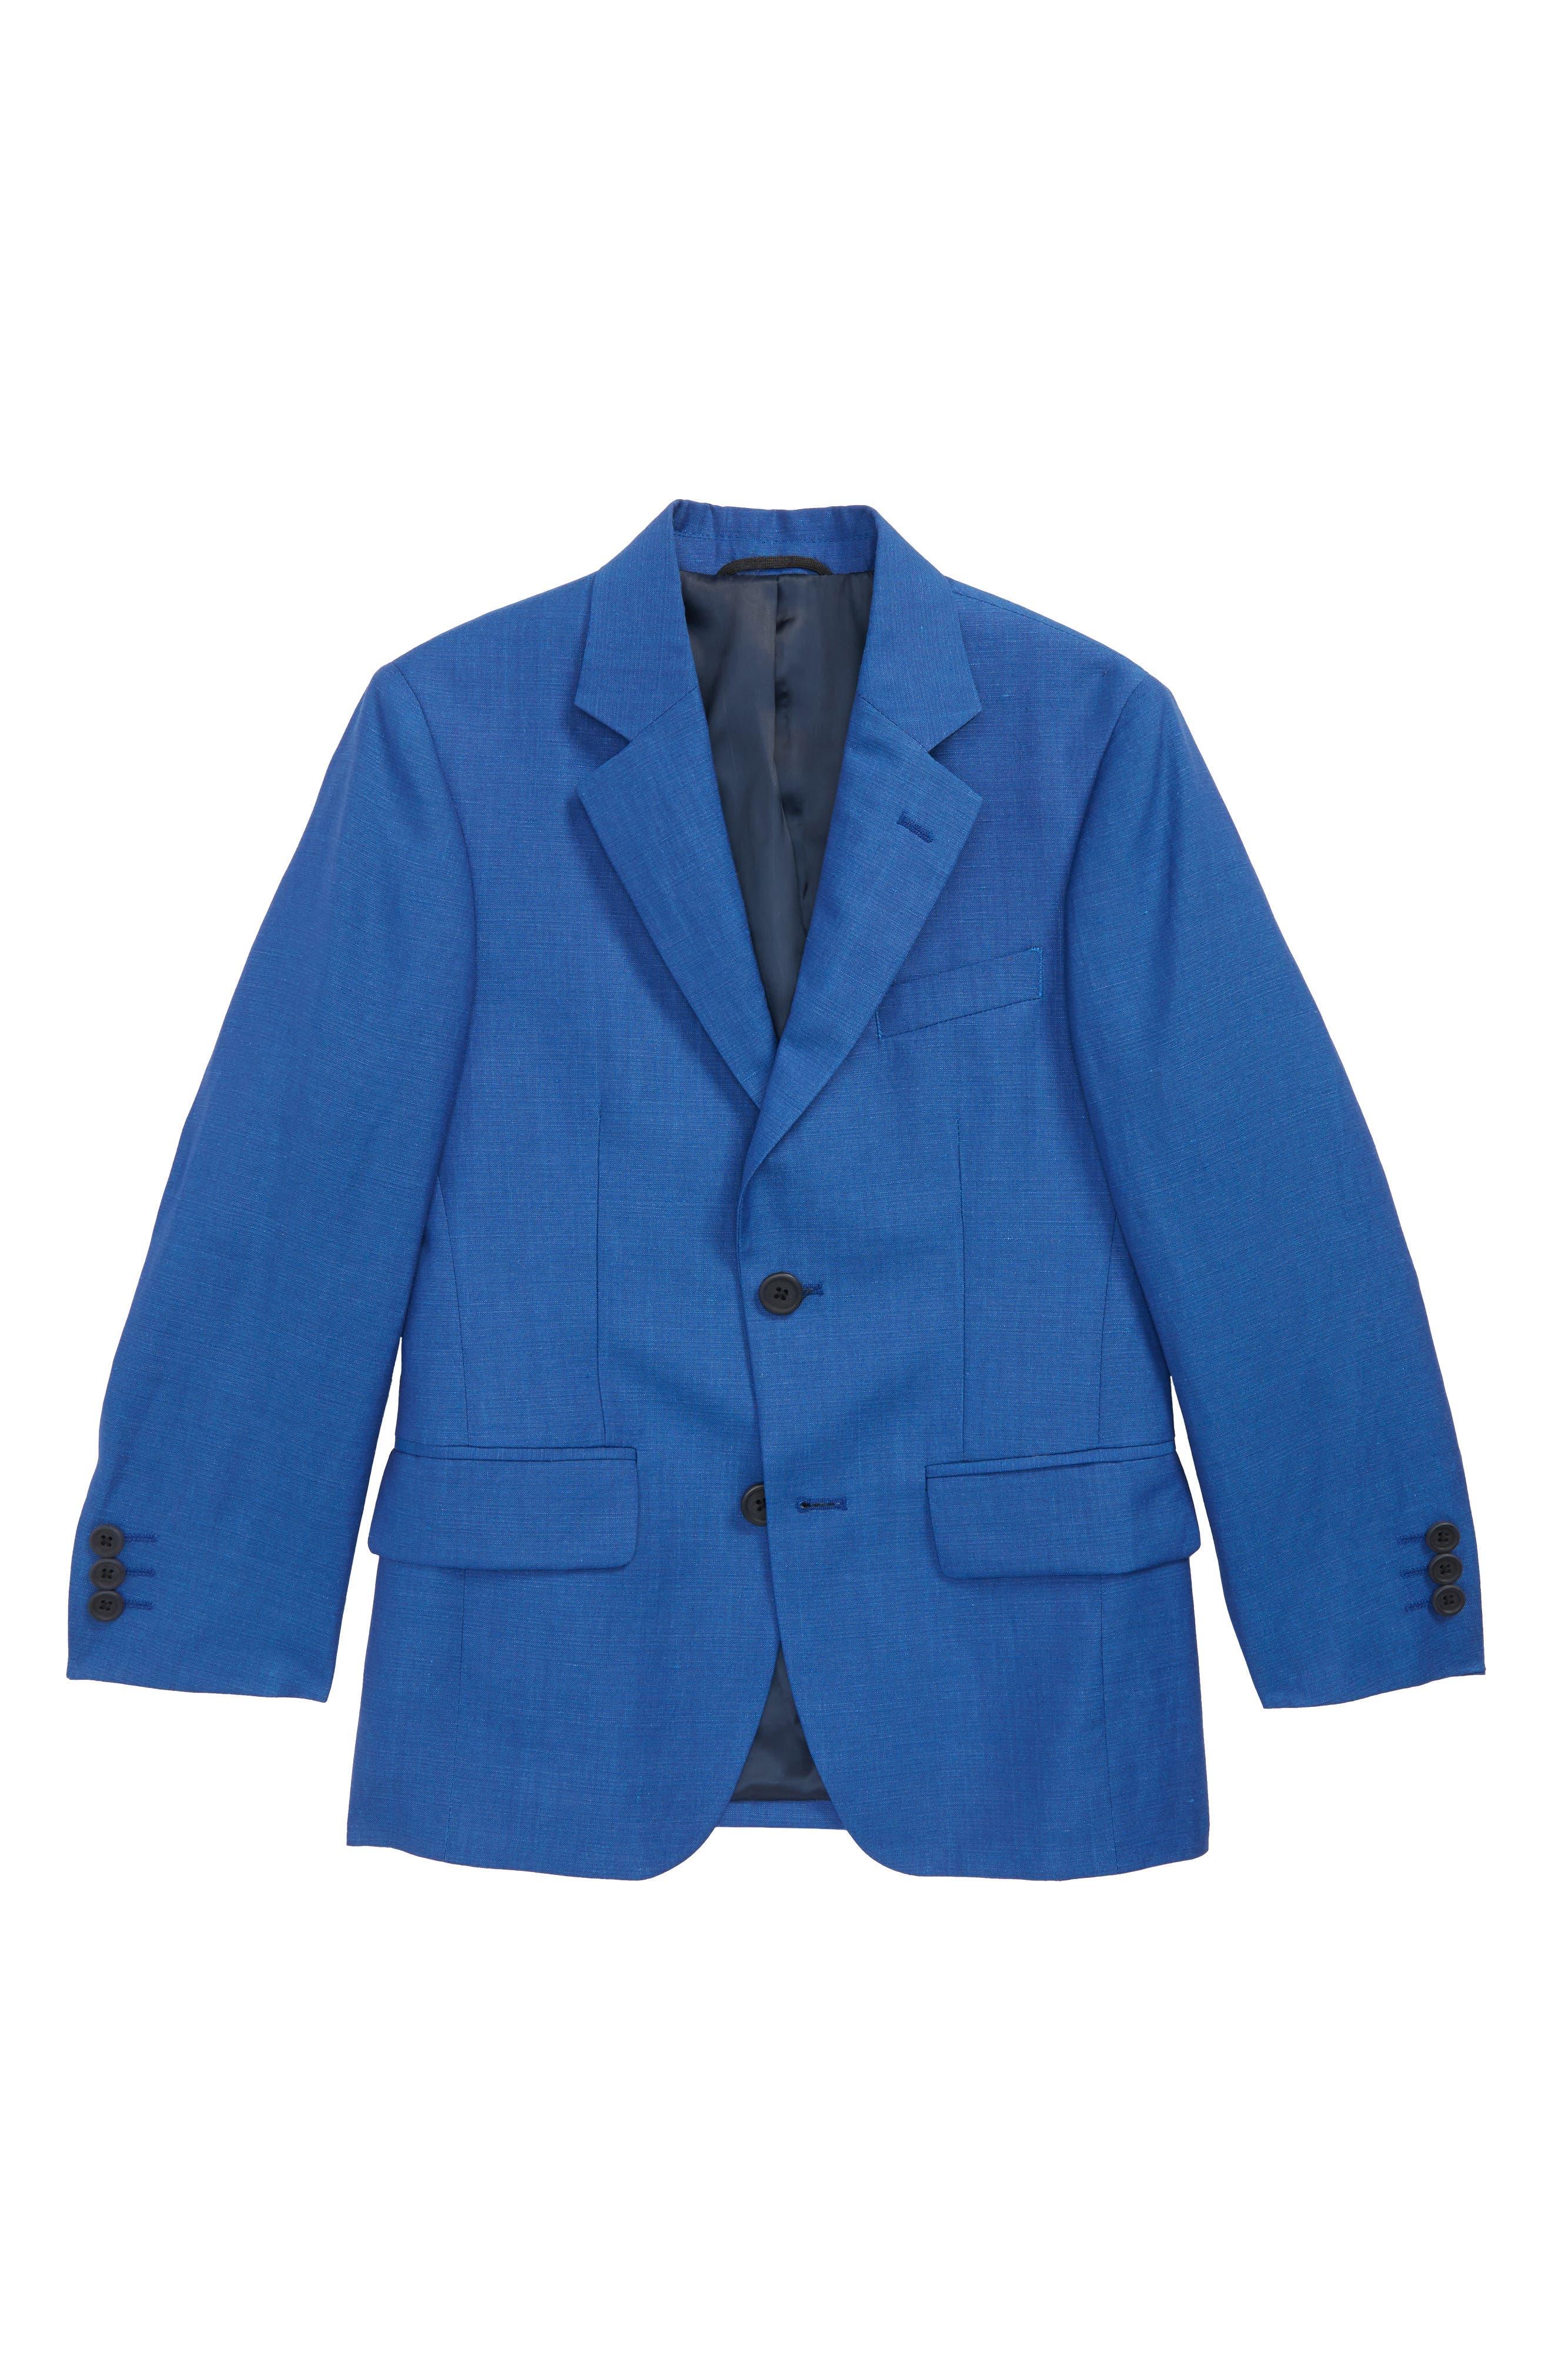 Wool & Linen Sport Coat,                         Main,                         color, 422